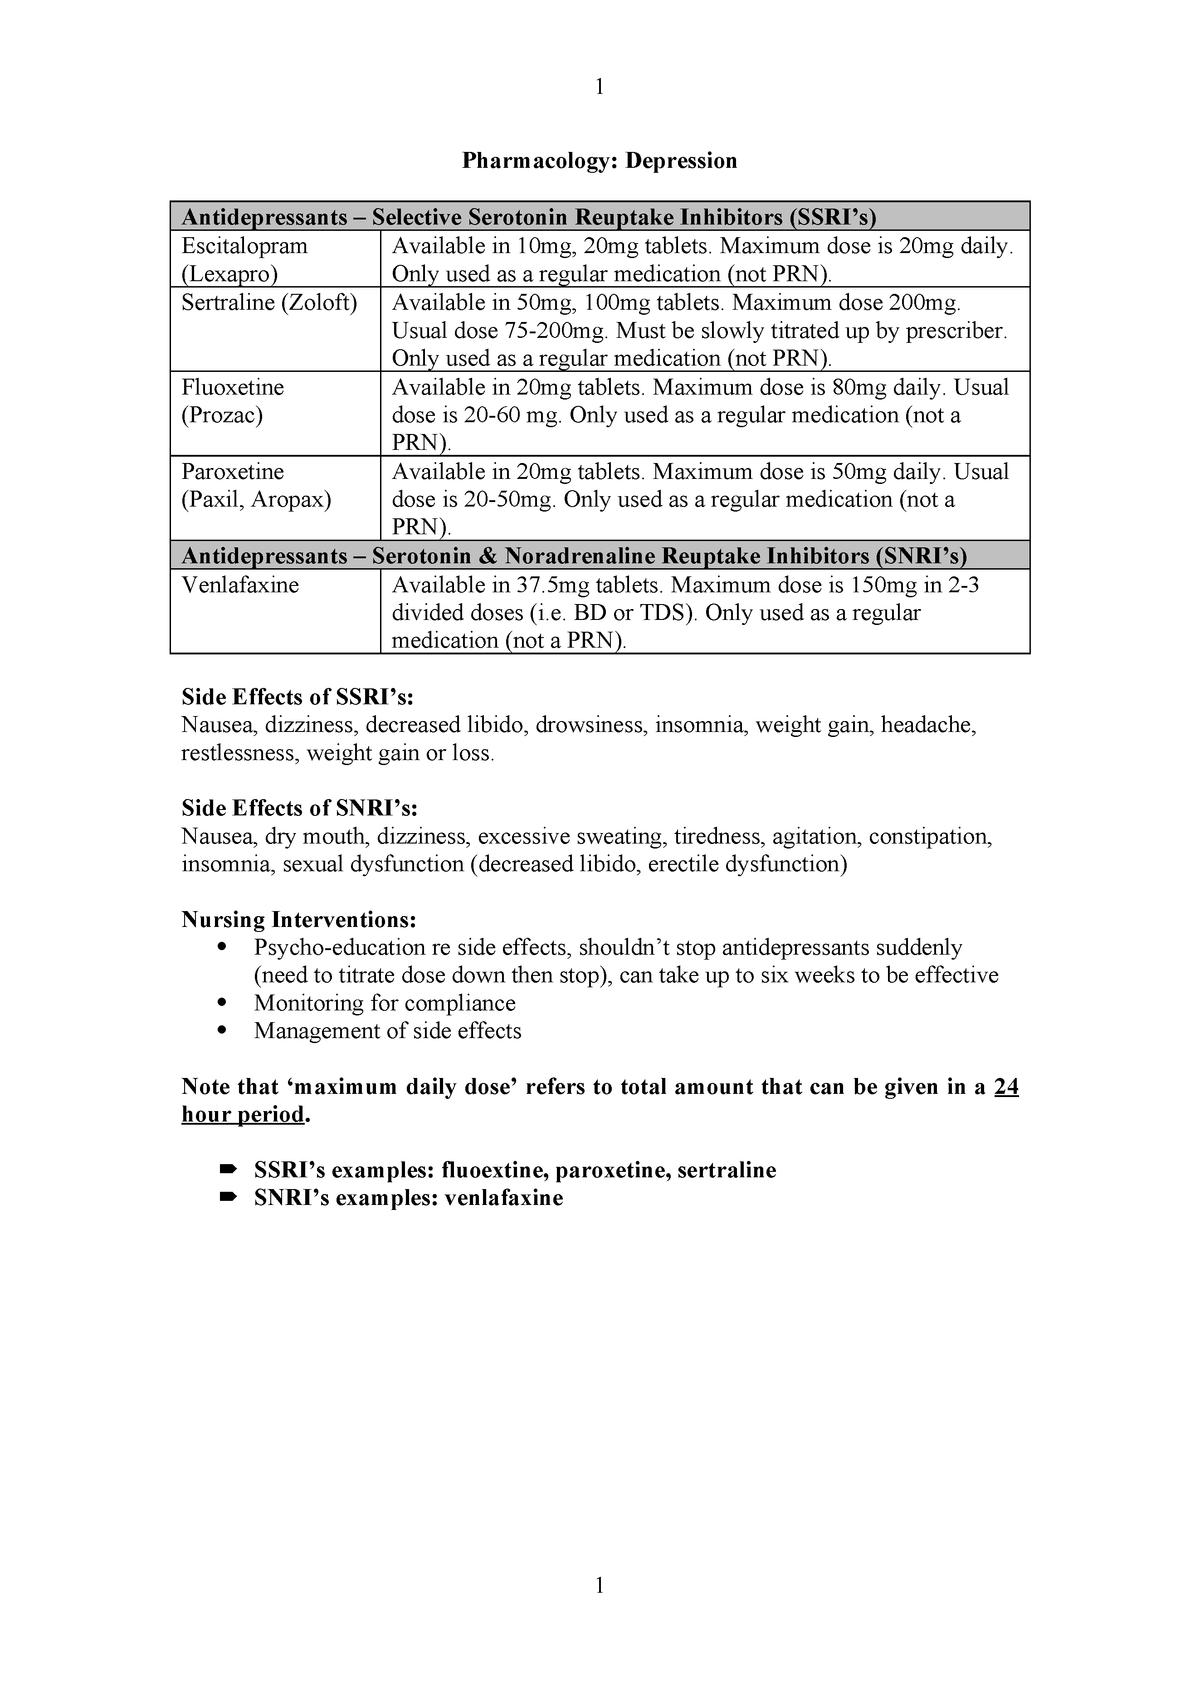 Exam preparation Pharmacology depression - HNB2206 - StuDocu